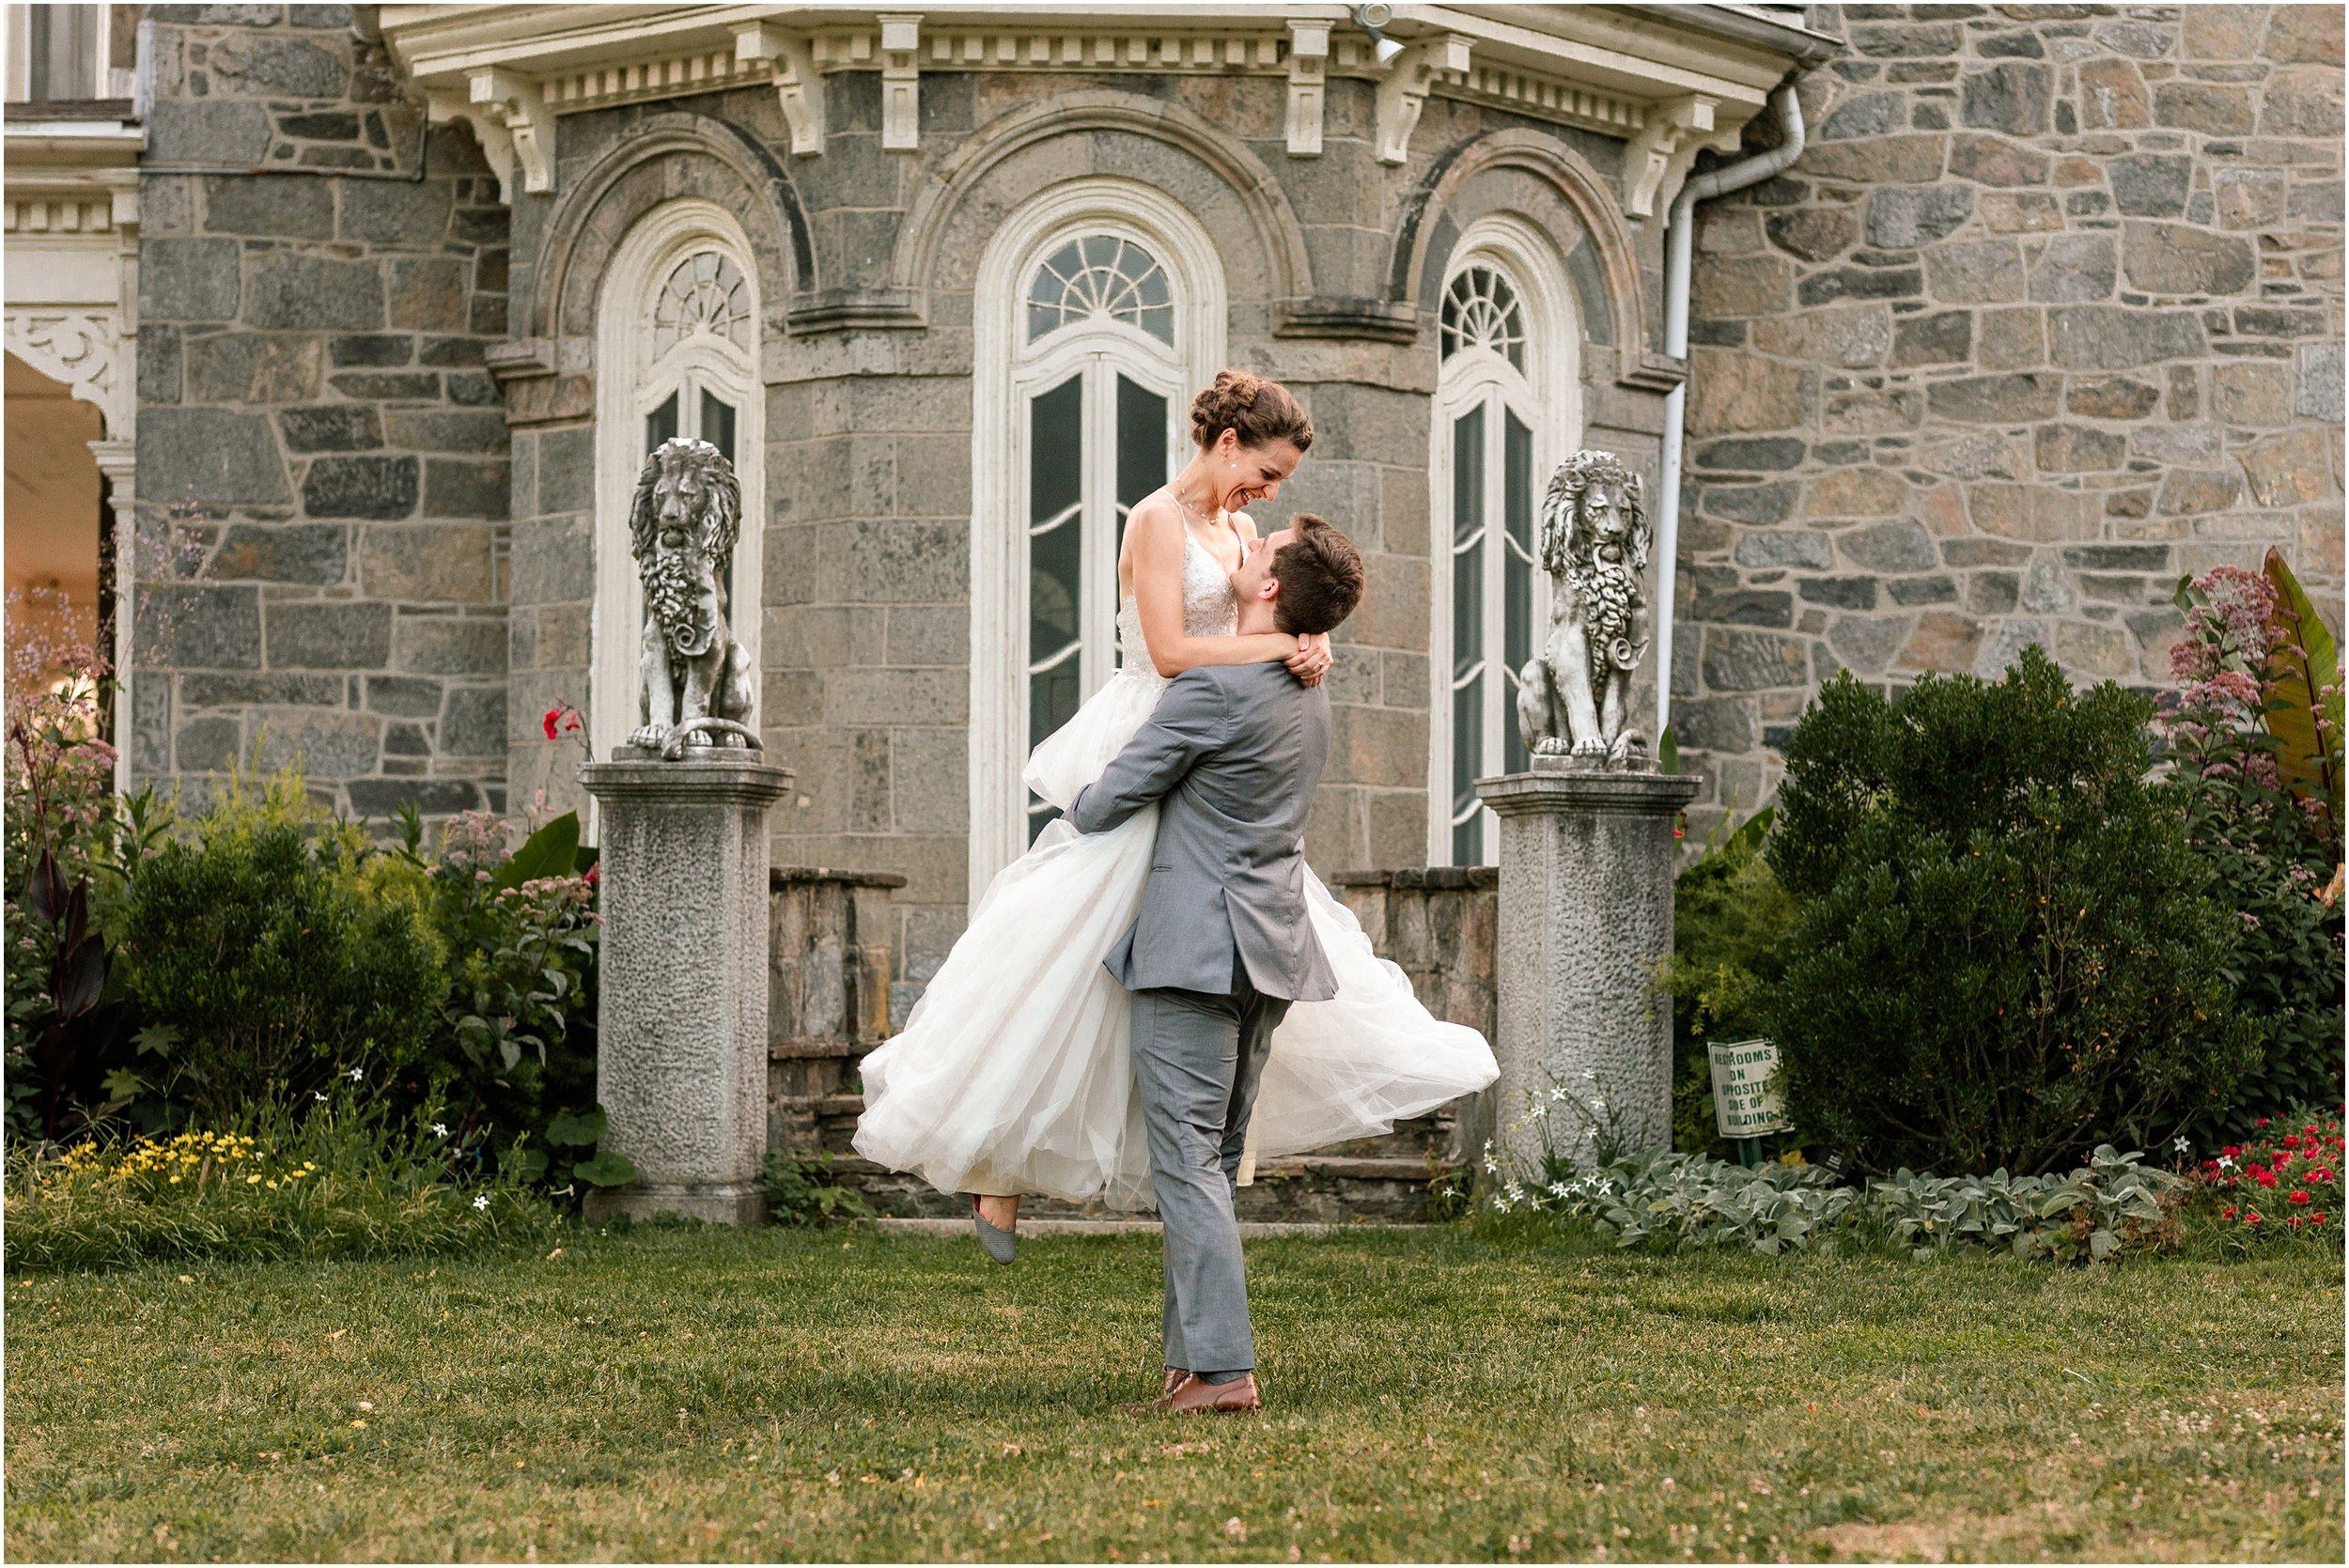 hannah leigh photography Cylburn Arboretum Wedding Baltimore, MD_3466.jpg